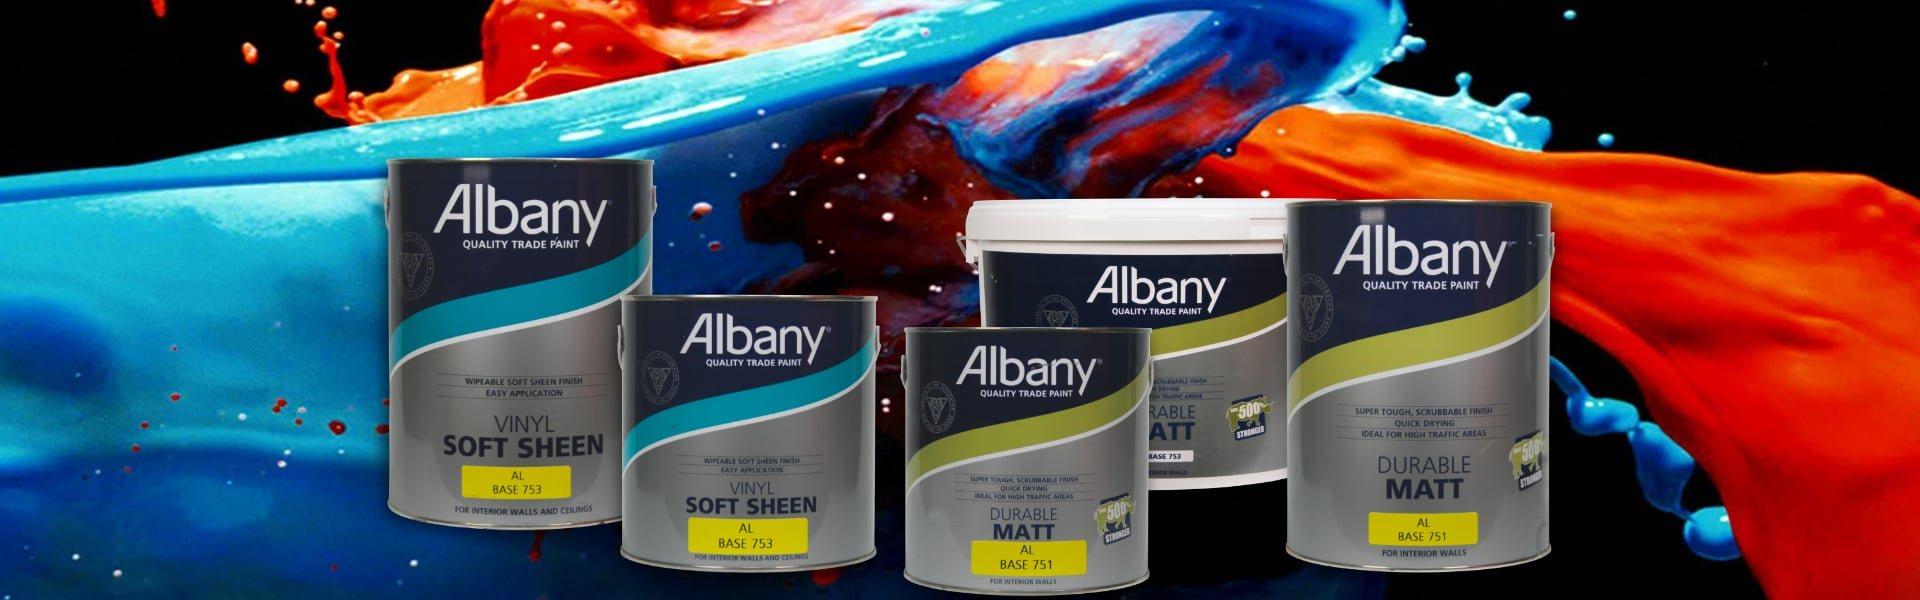 Albany Paint